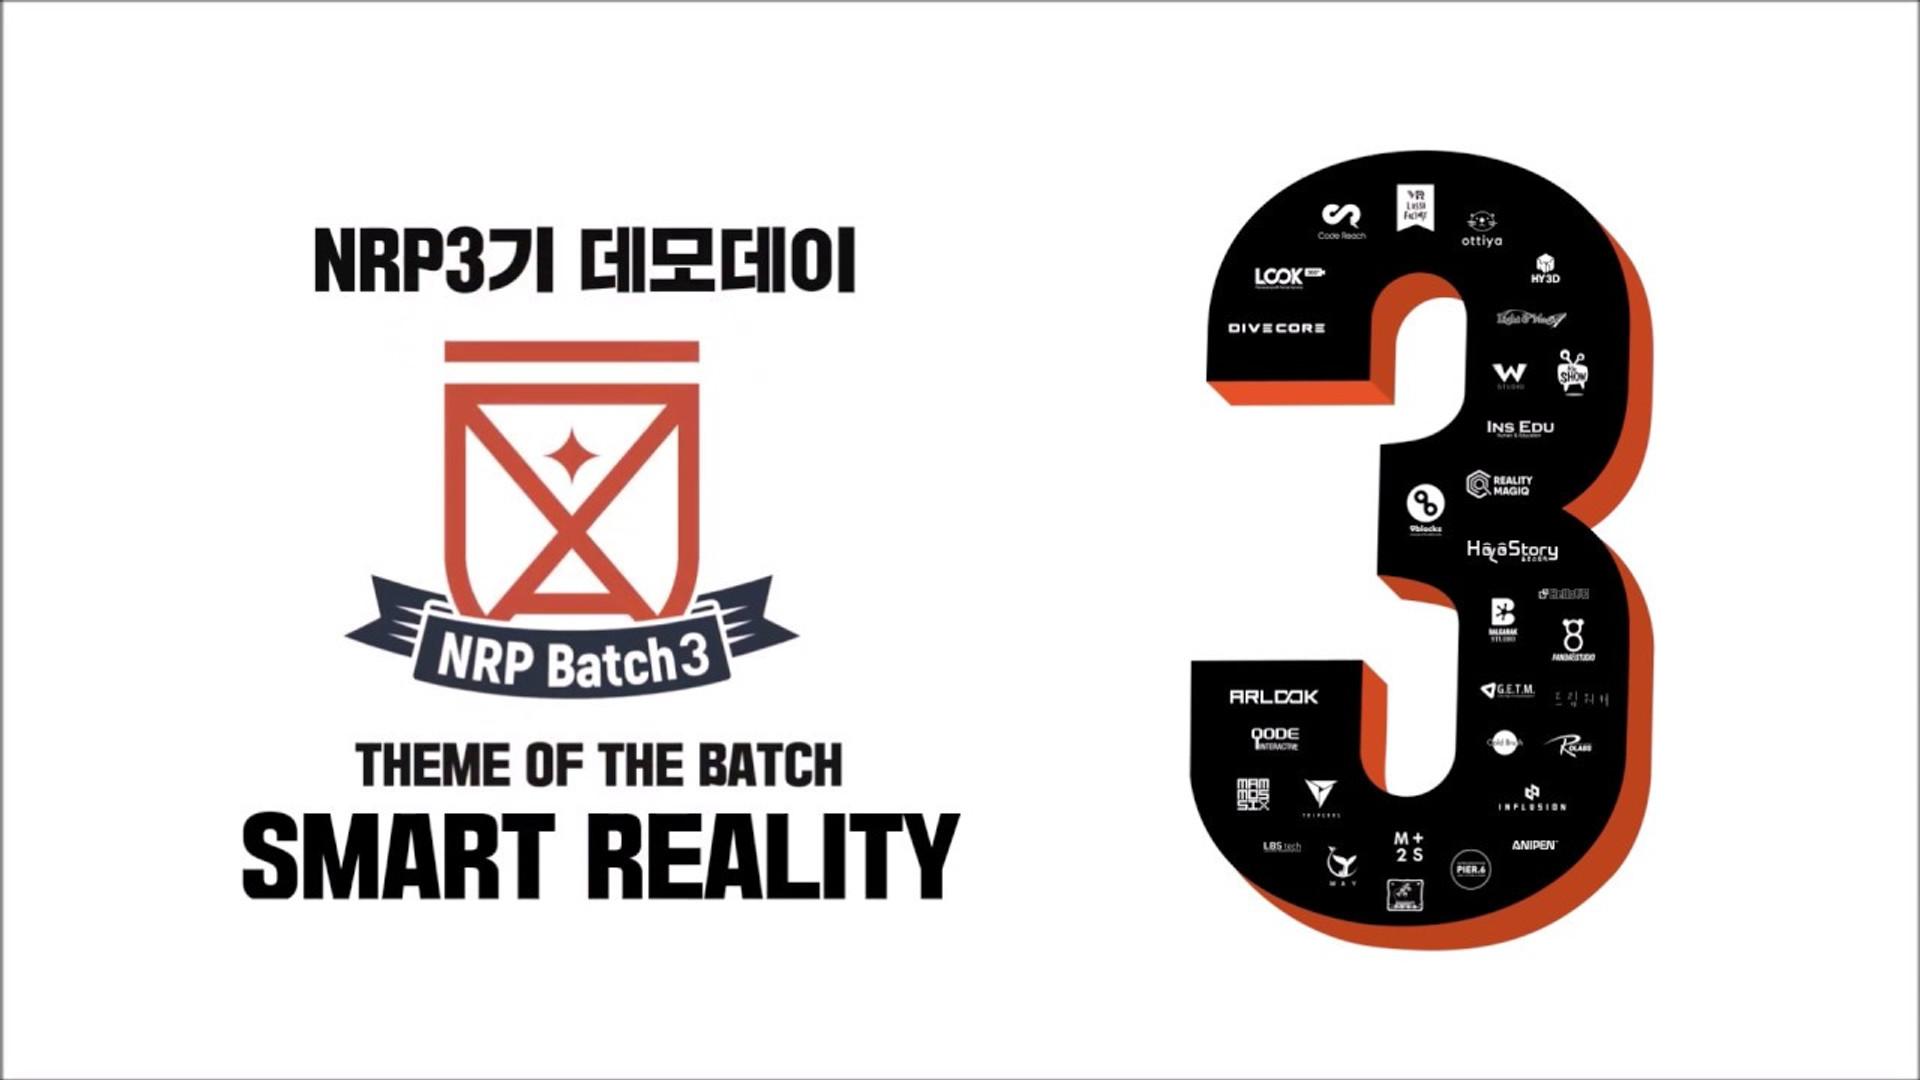 NRP 3 signal